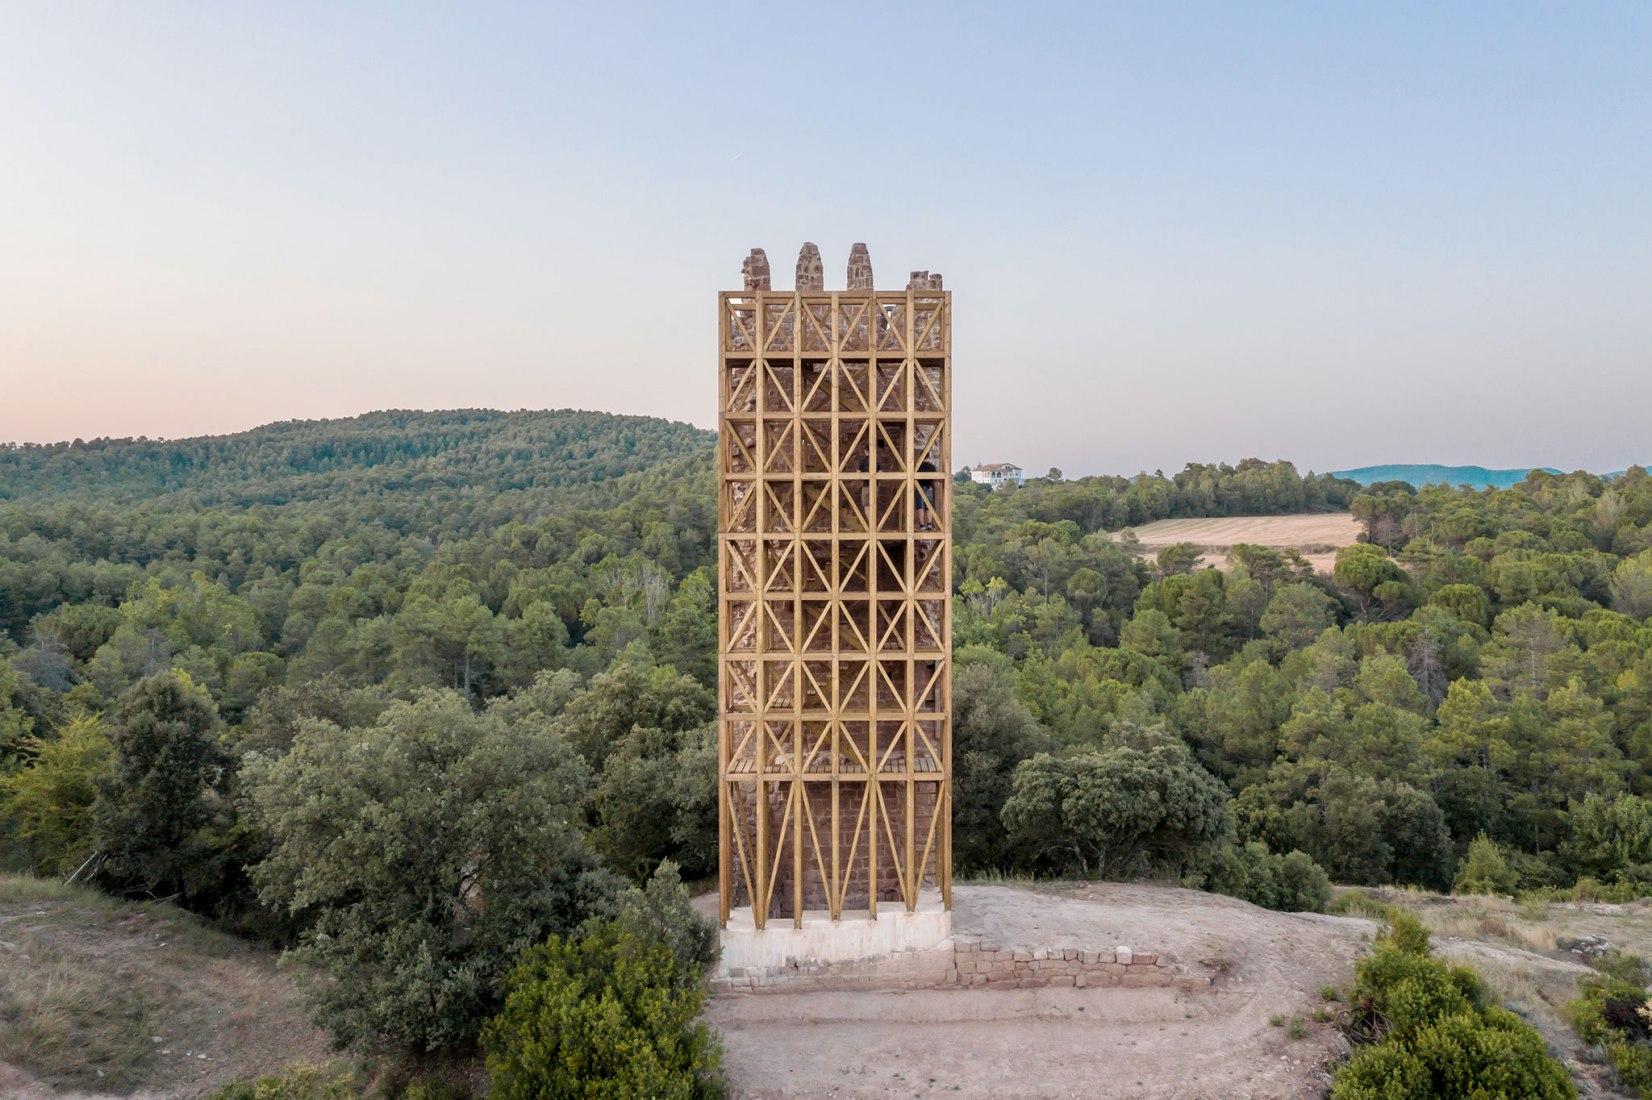 Torre Merola por Carles Enrich. Fotografía por Adrià Goula